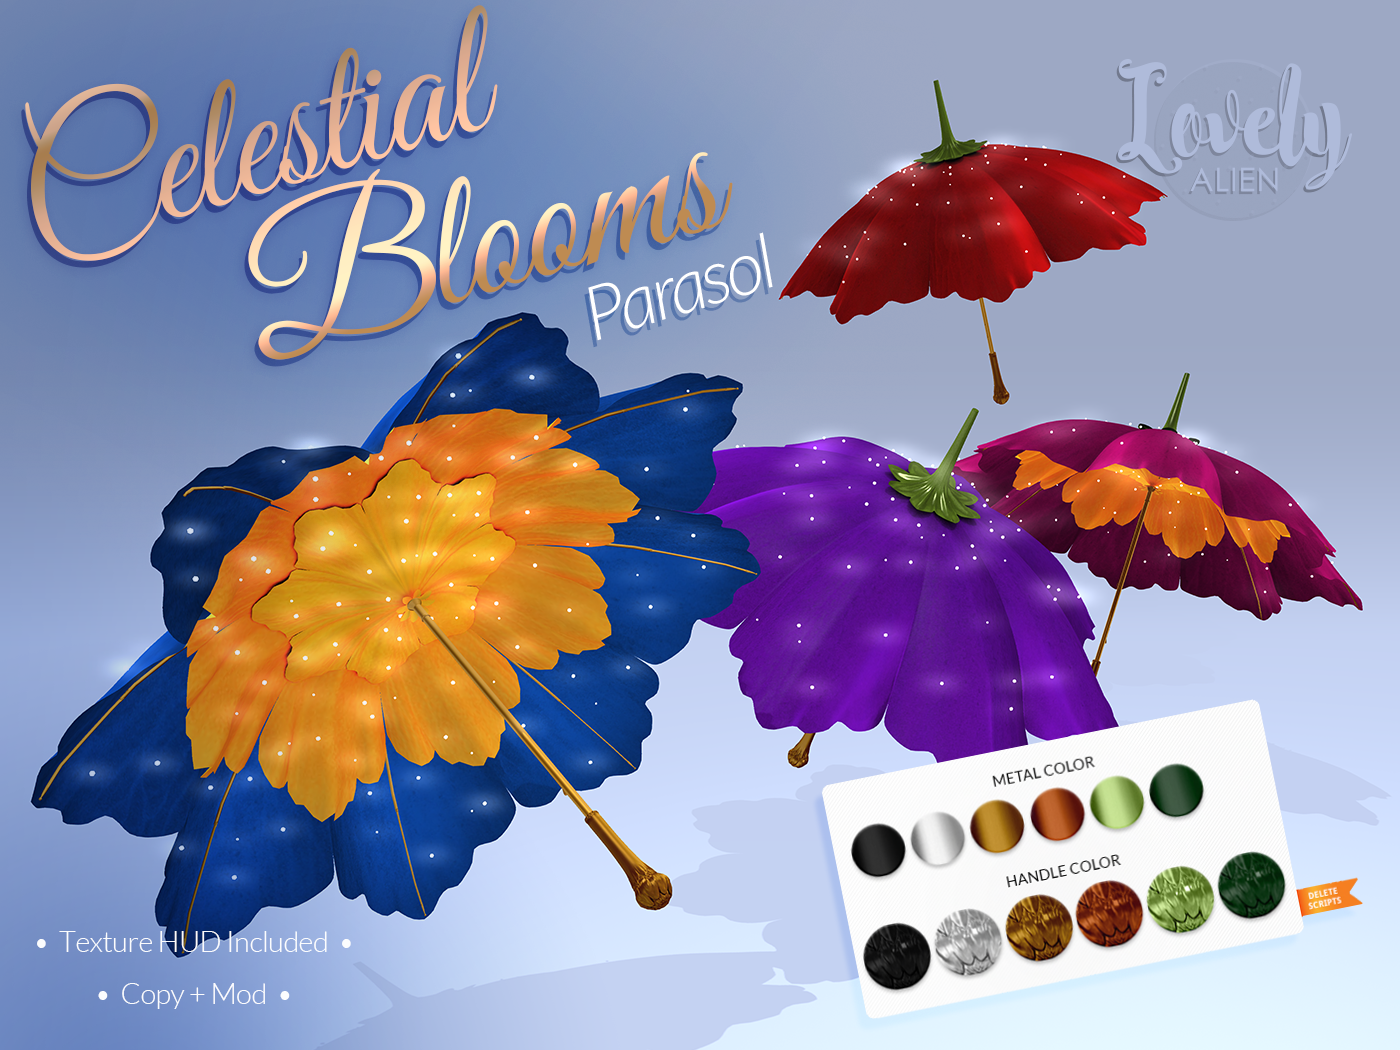 Lovely Alien - Celestial Blooms Parasol.png